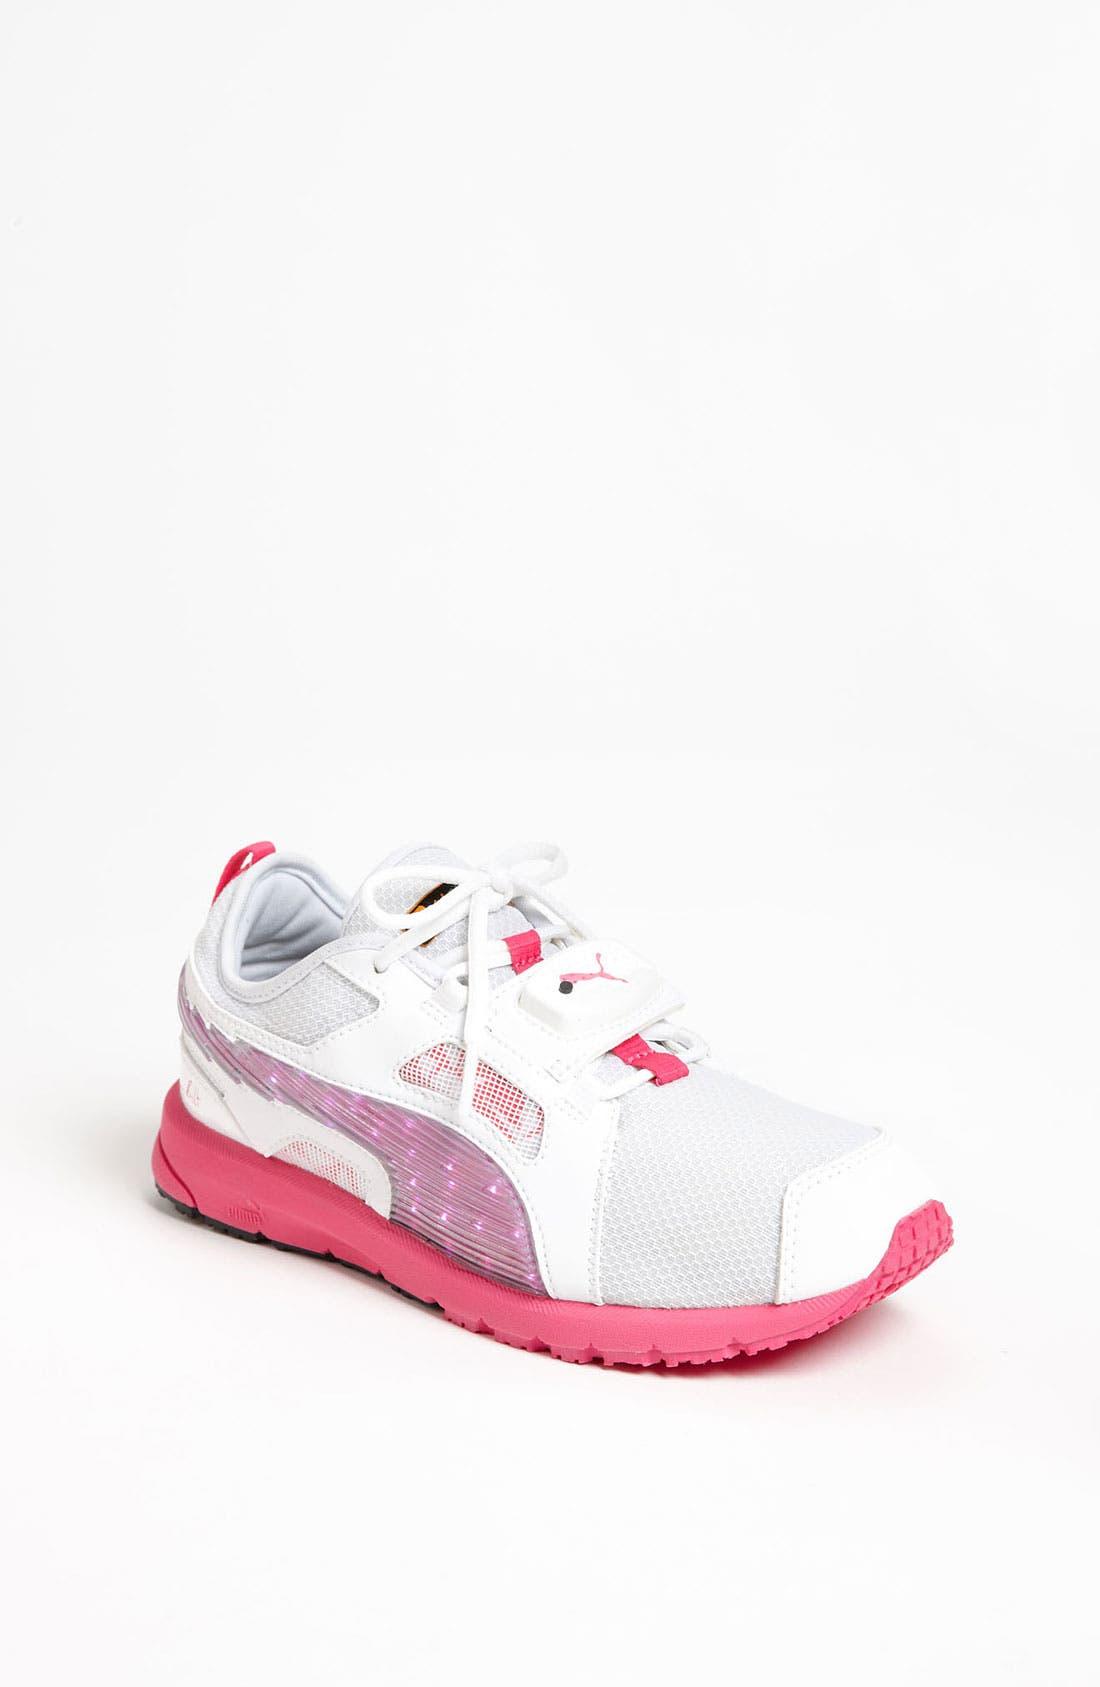 Main Image - PUMA 'Bolt evoSPEEDOMETER Jr.' Sneaker (Toddler, Little Kid & Big Kid)